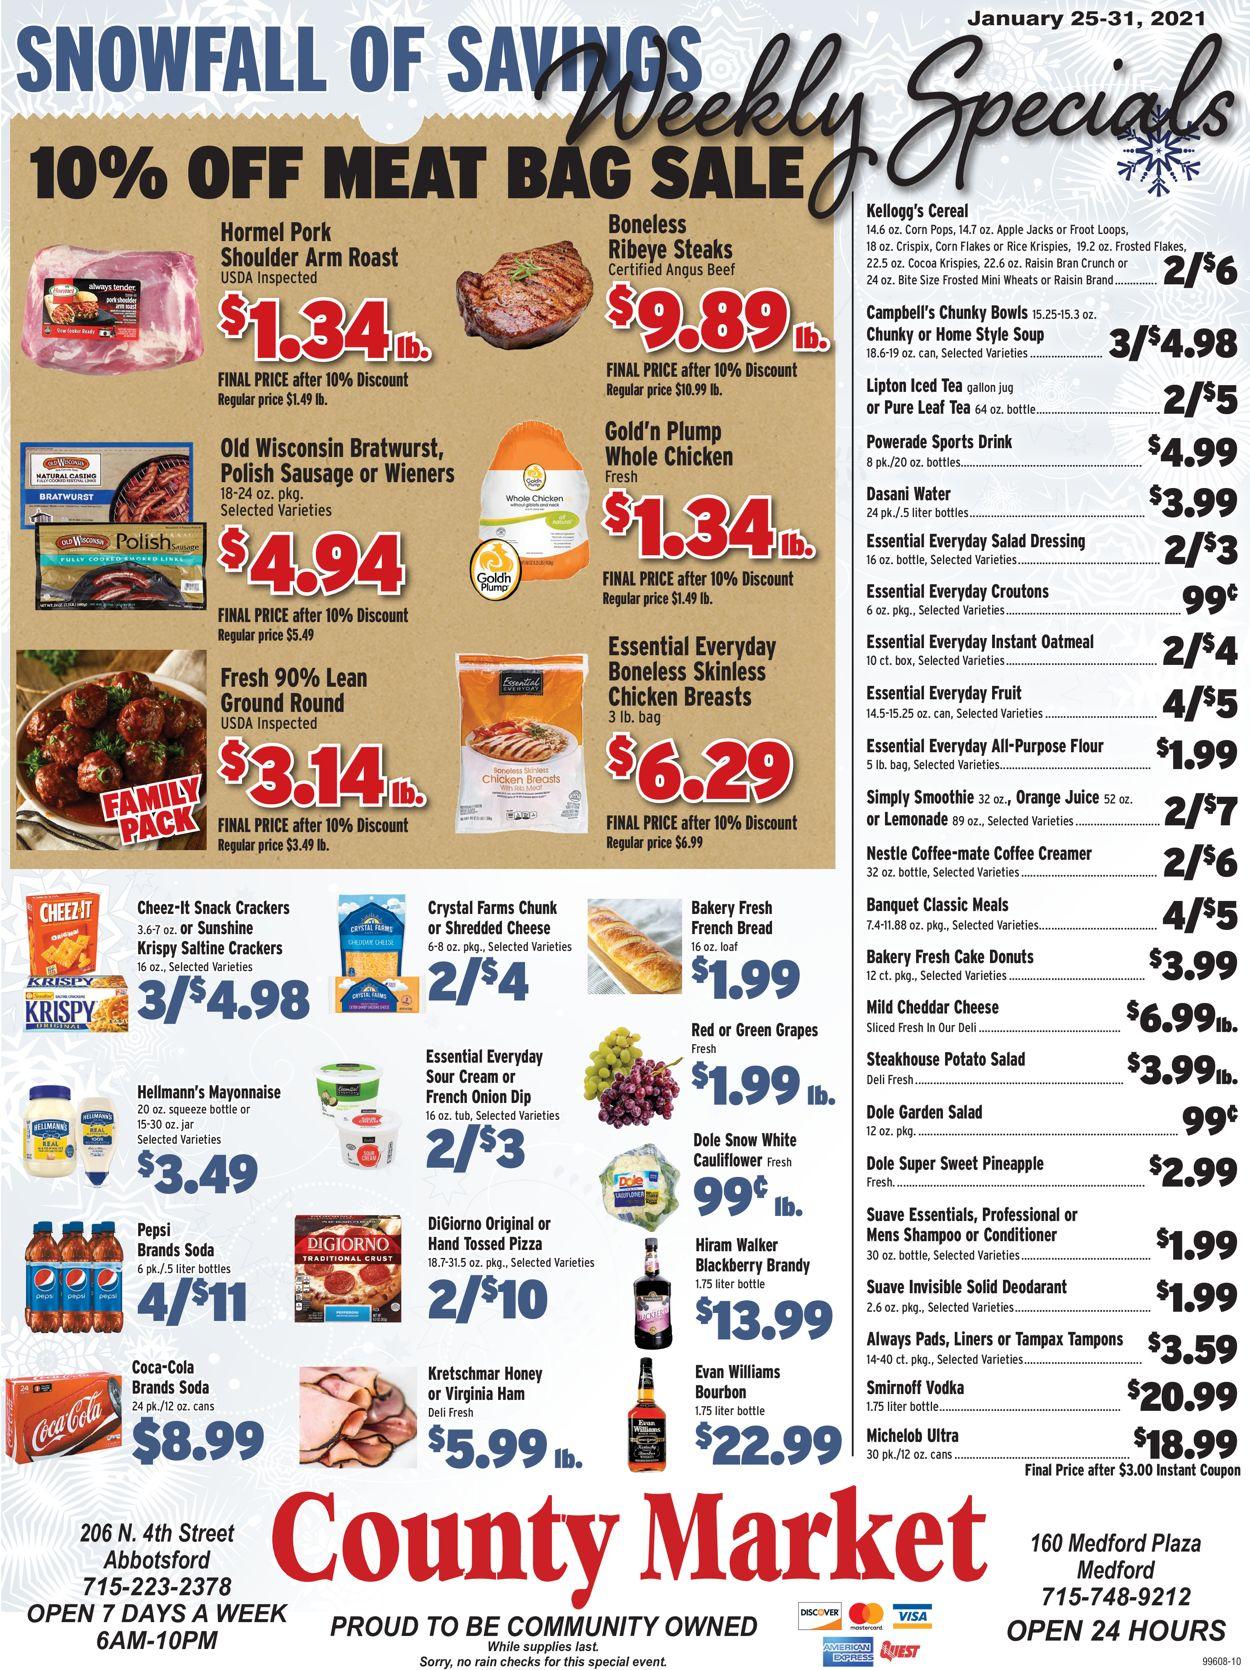 County Market Weekly Ad Circular - valid 01/25-01/31/2021